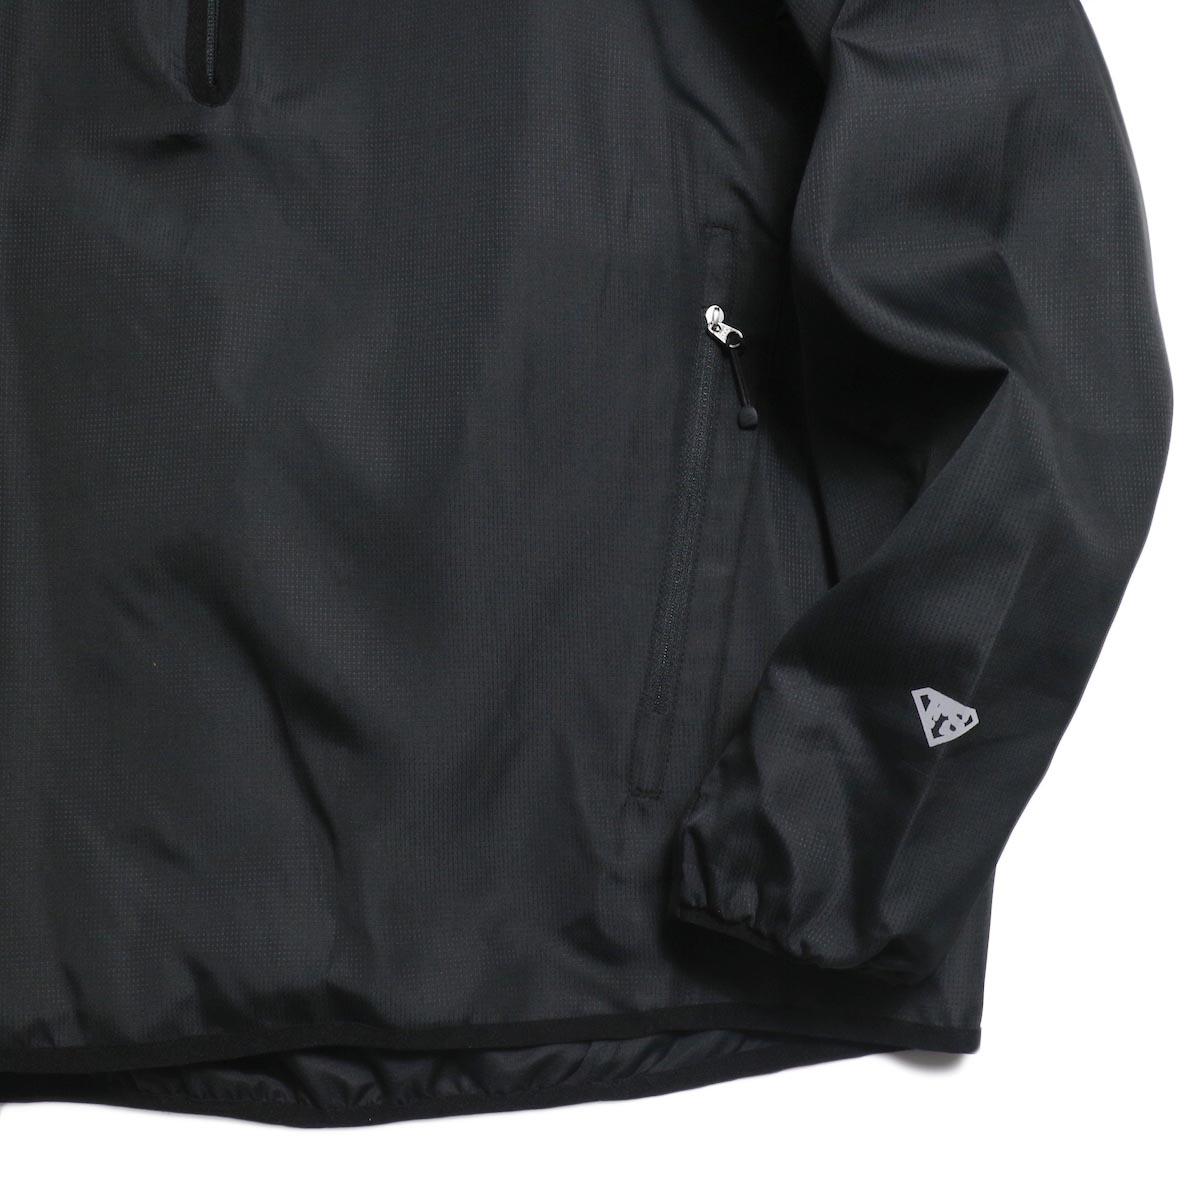 Free Speech / Half Zip Pullover Blouson -Black 袖、裾